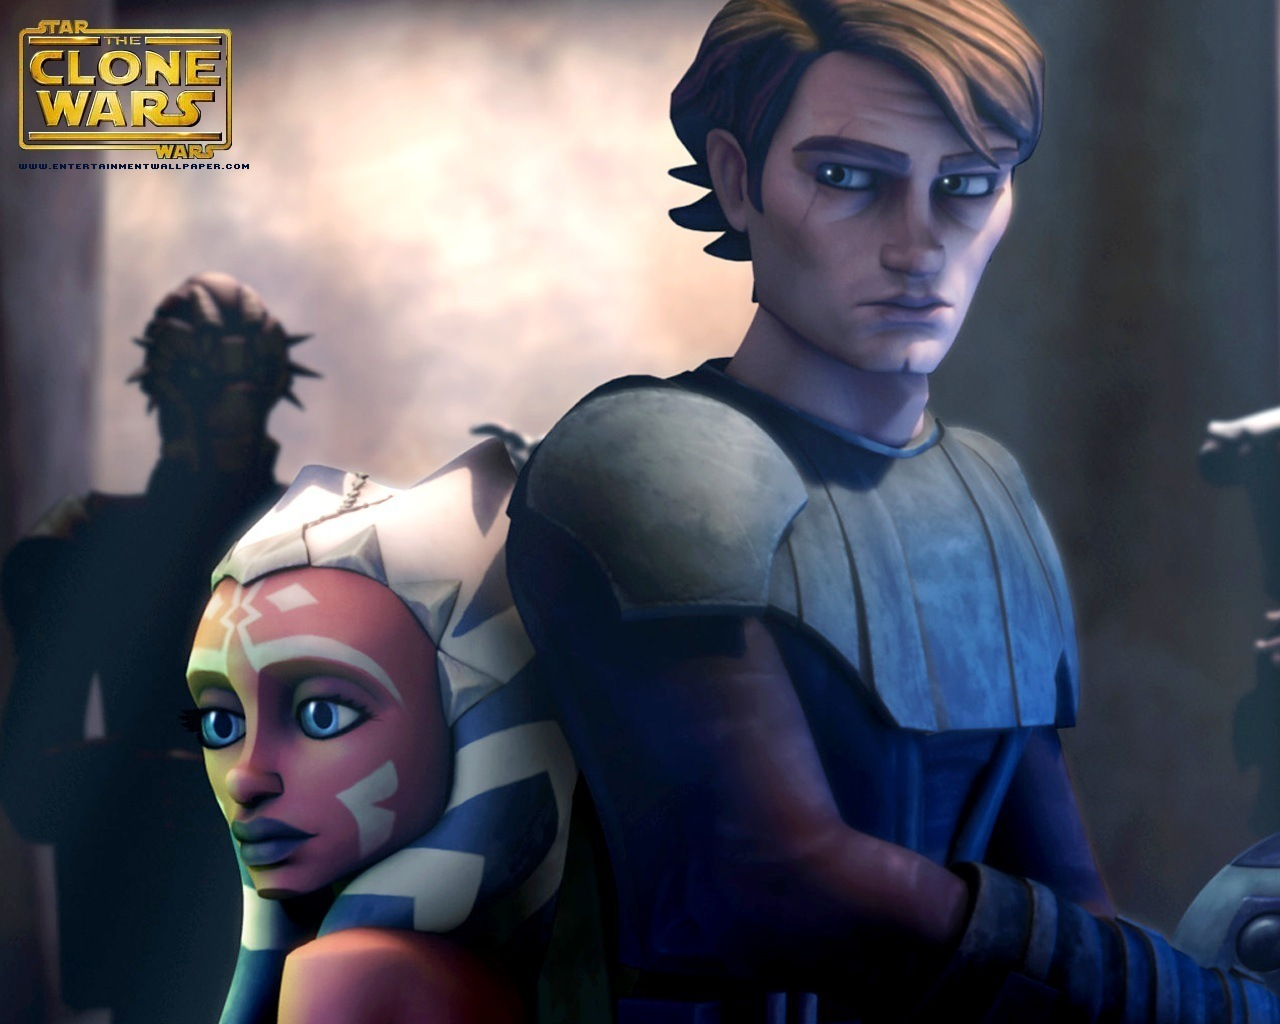 Cute Ahsoka And Anakin Picture Wallpaper Jedi Ahsoka